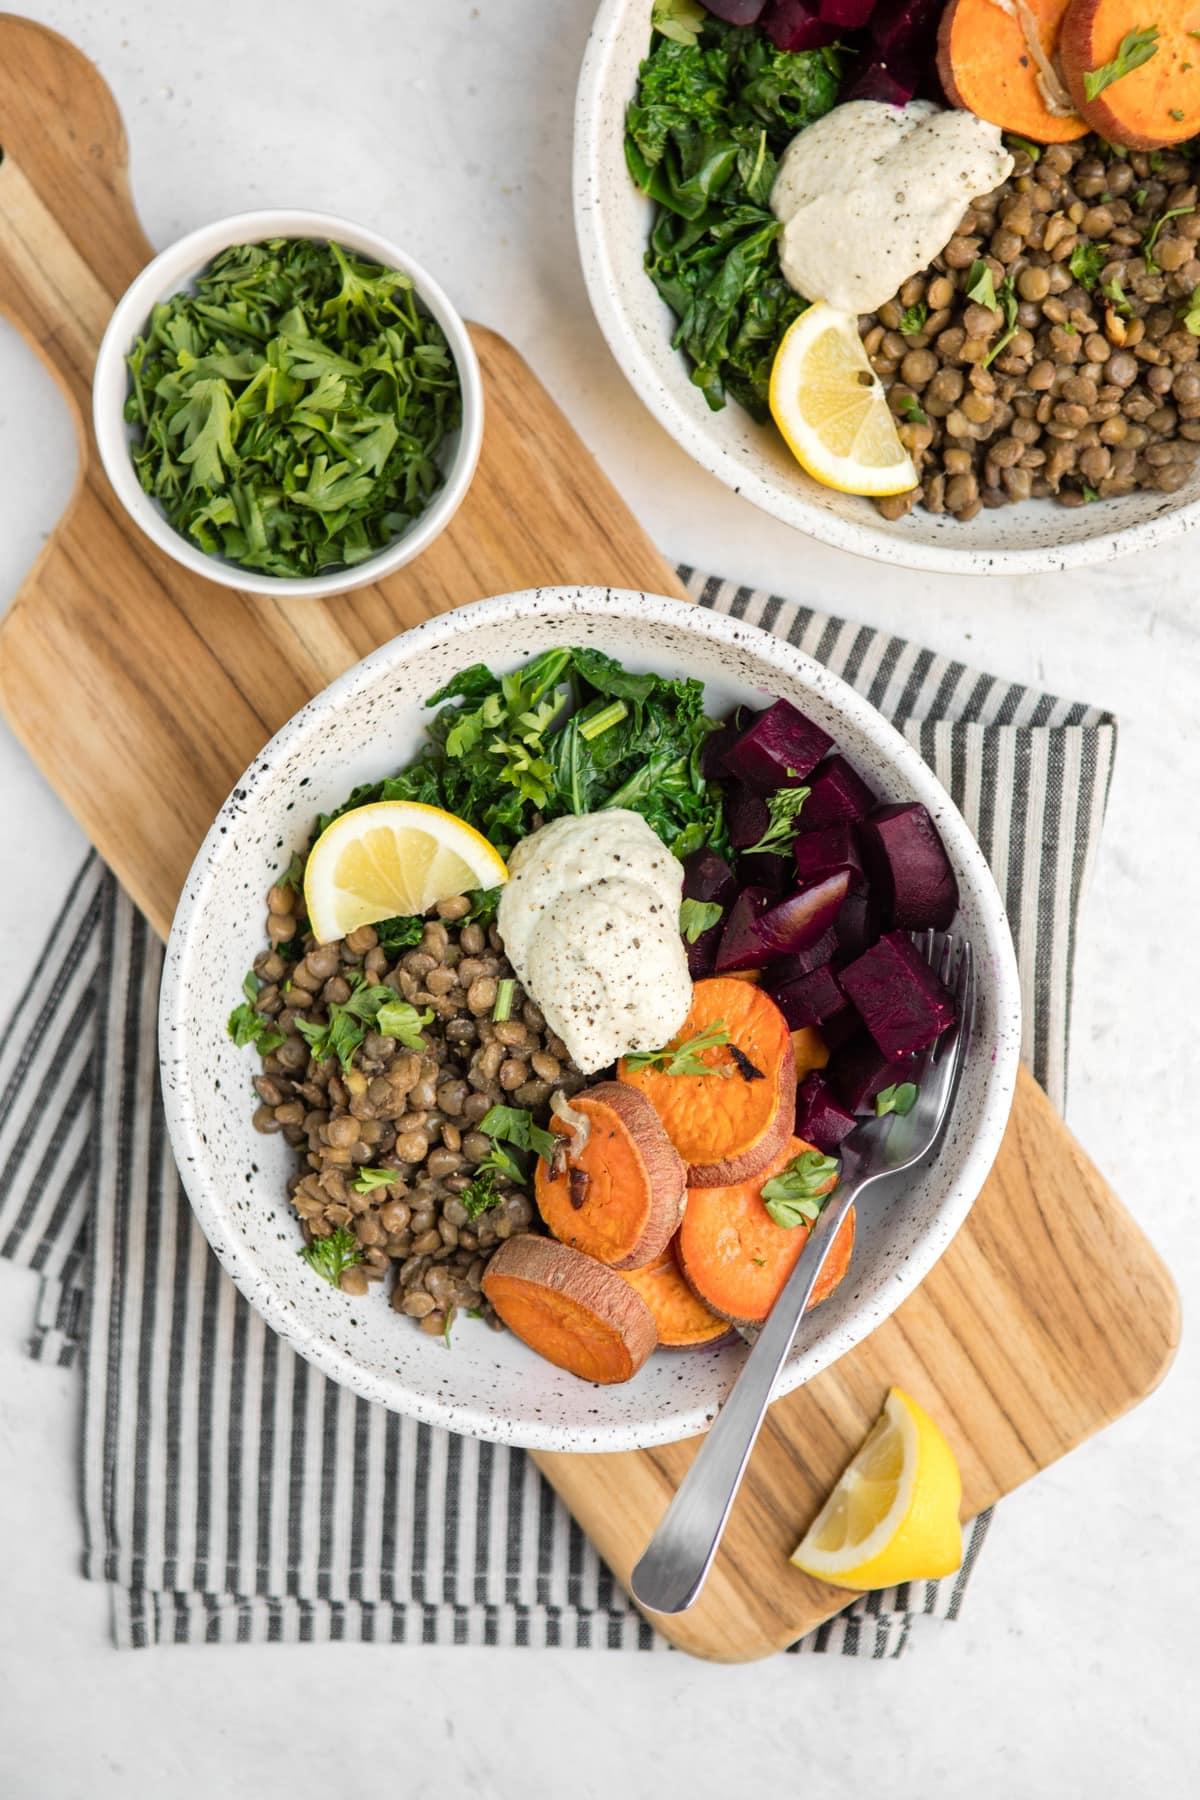 white bowls of warm lentil salad with roasted vegetables on black striped towel